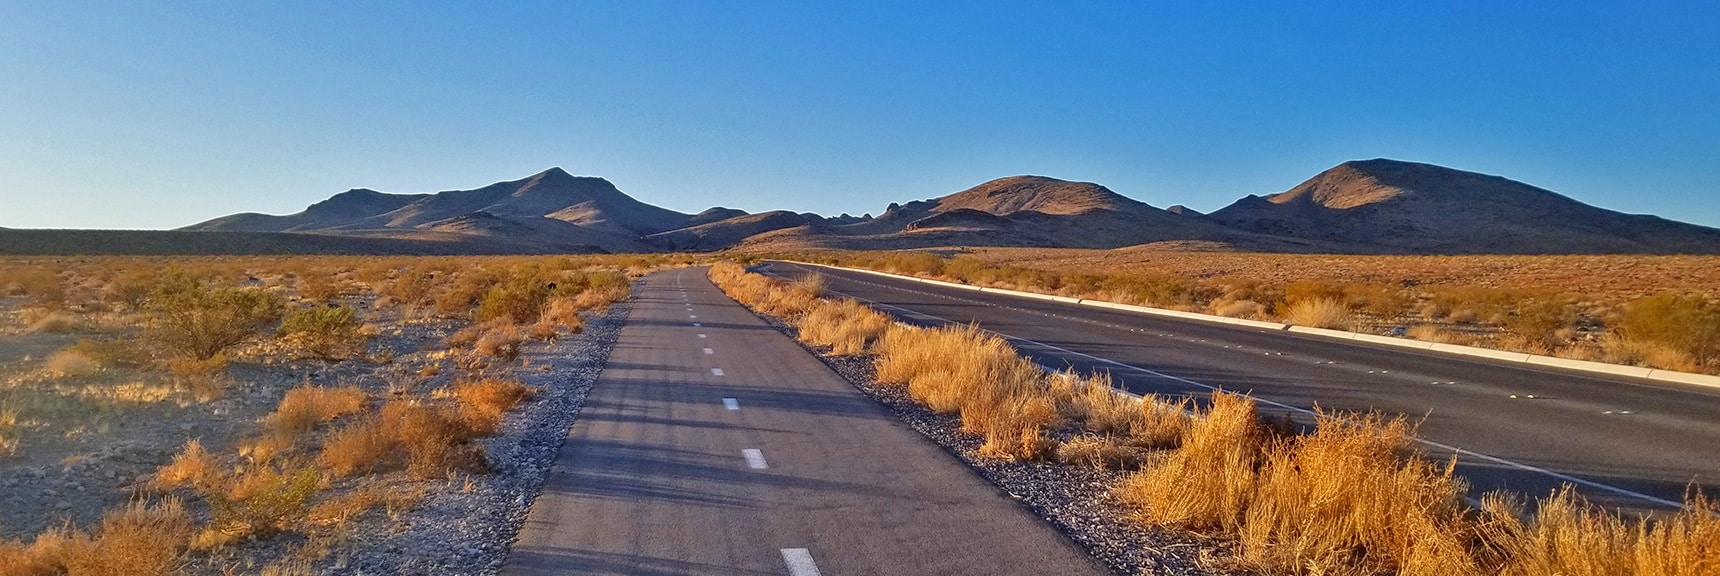 Approaching Petroglyph Canyon | Petroglyph Canyon | Sloan Canyon National Conservation Area, Nevada